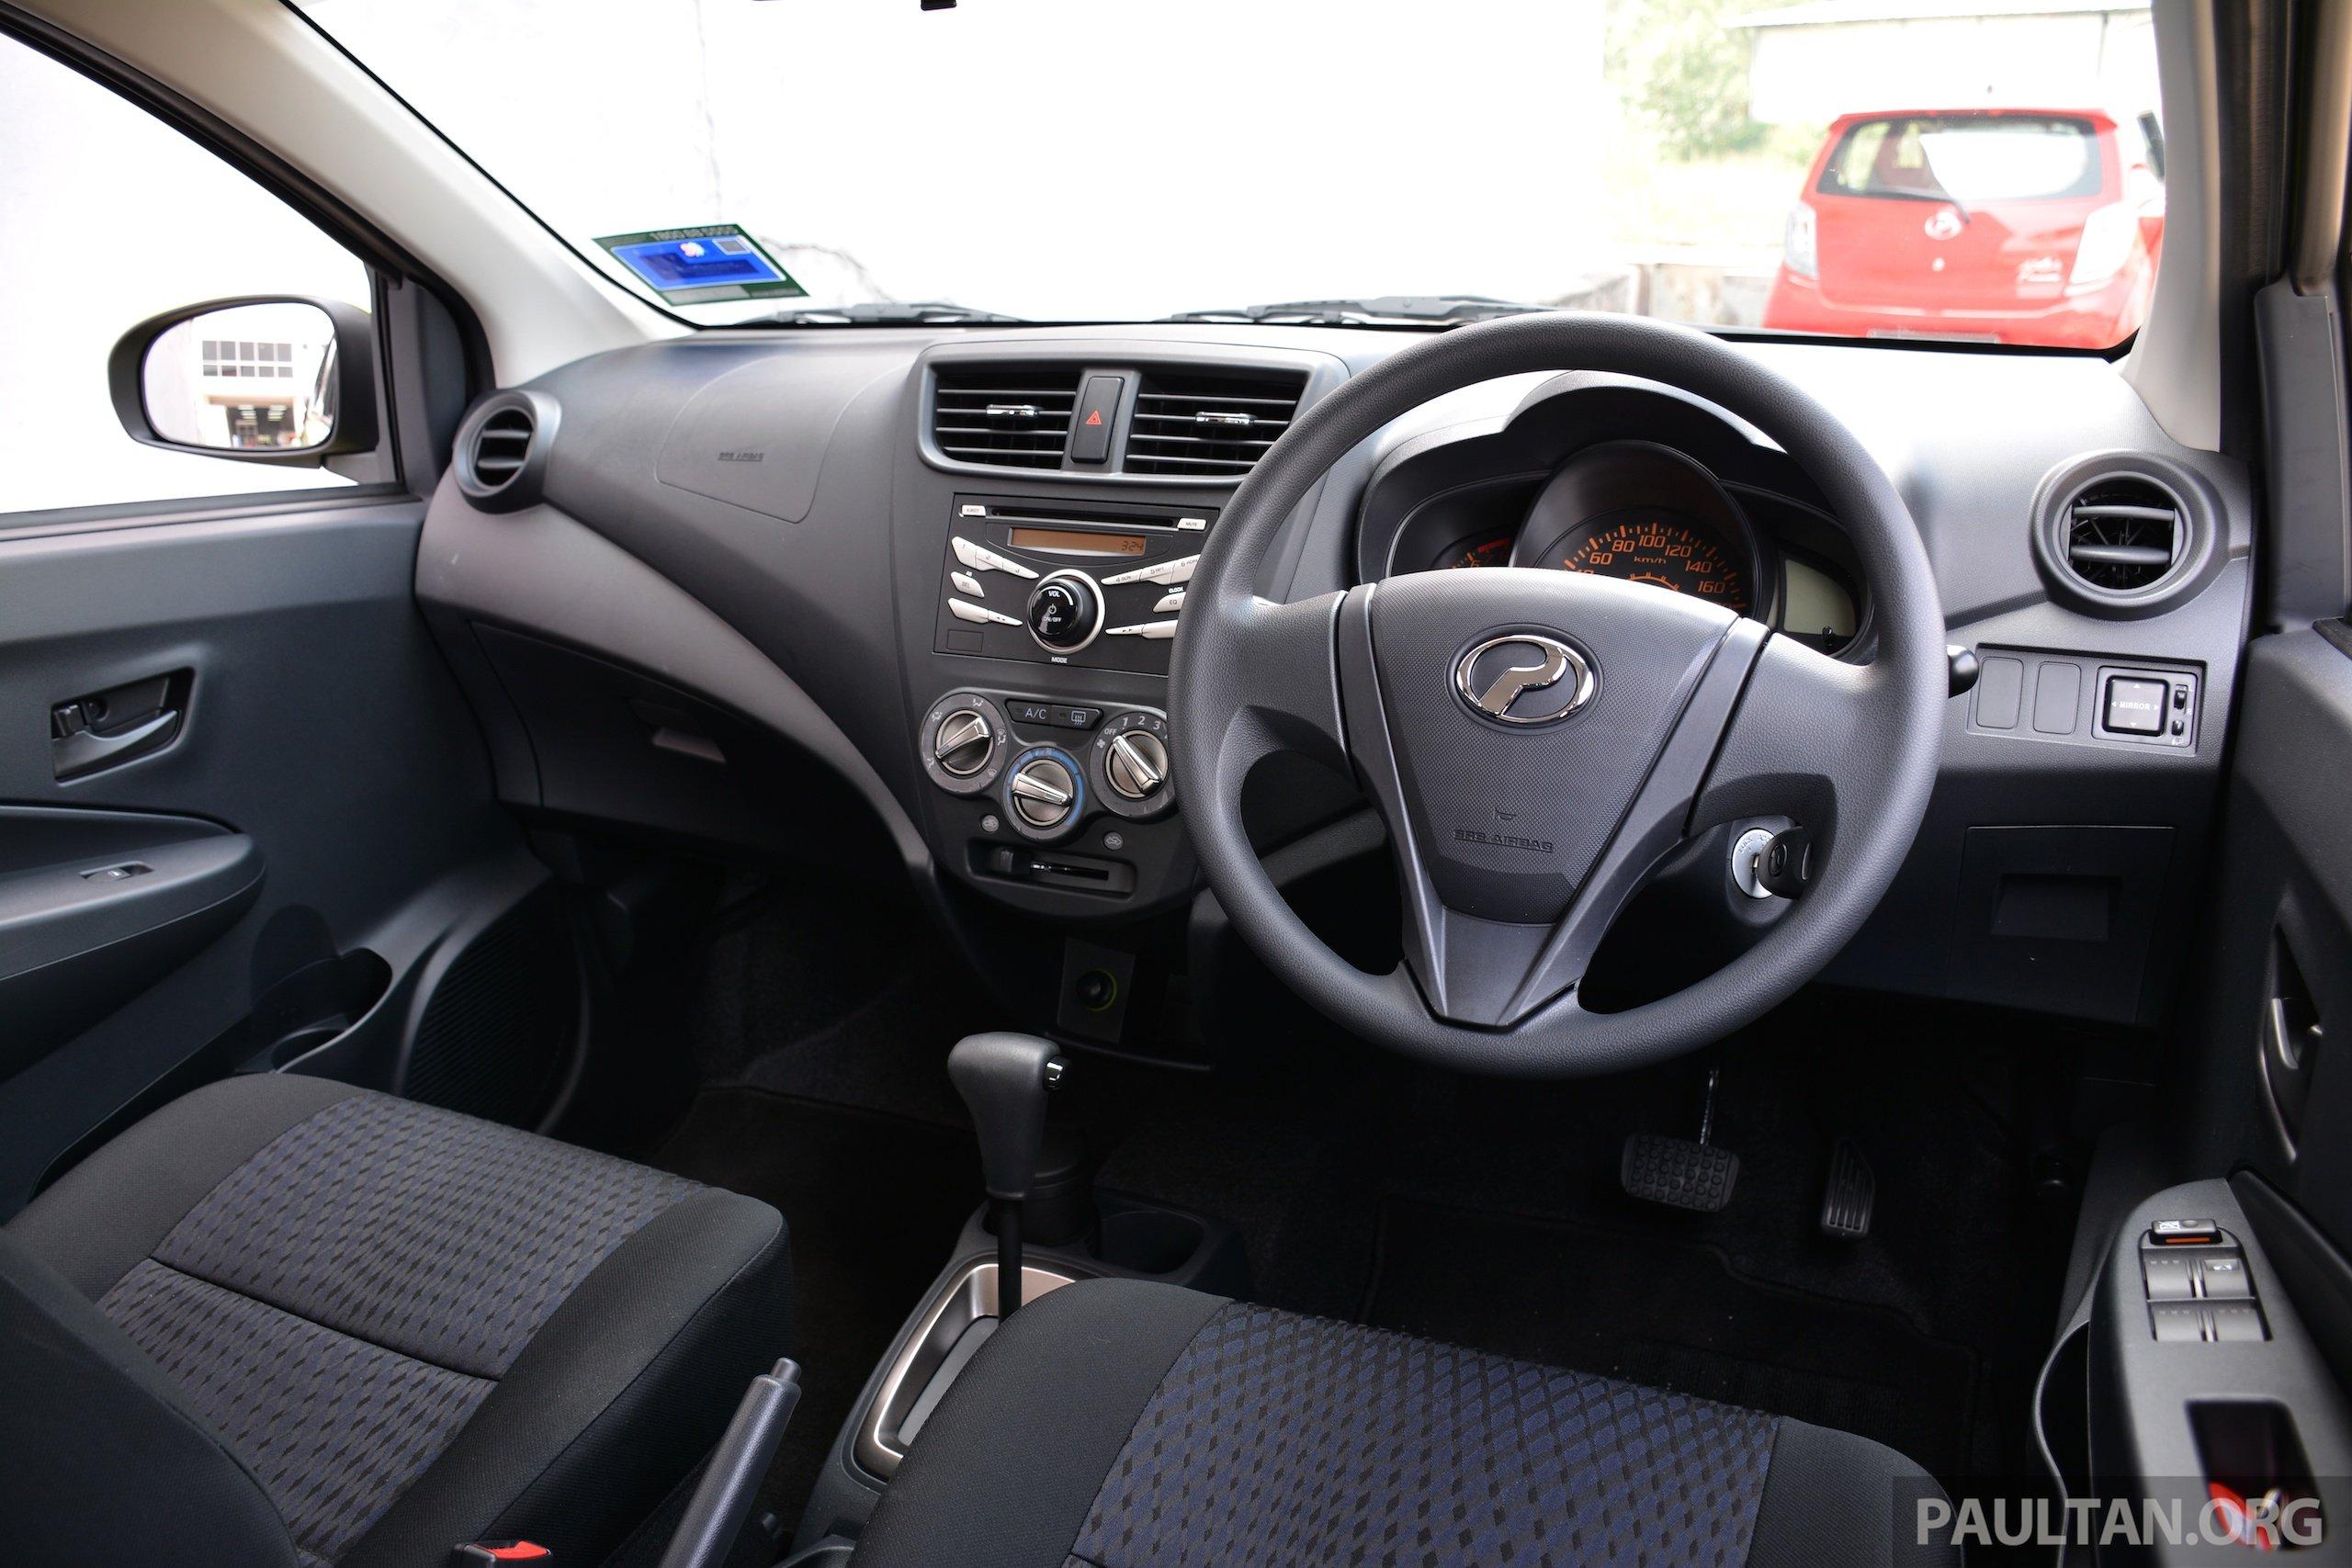 GALLERY: Perodua Axia Standard G vs Axia Advance Image 274393